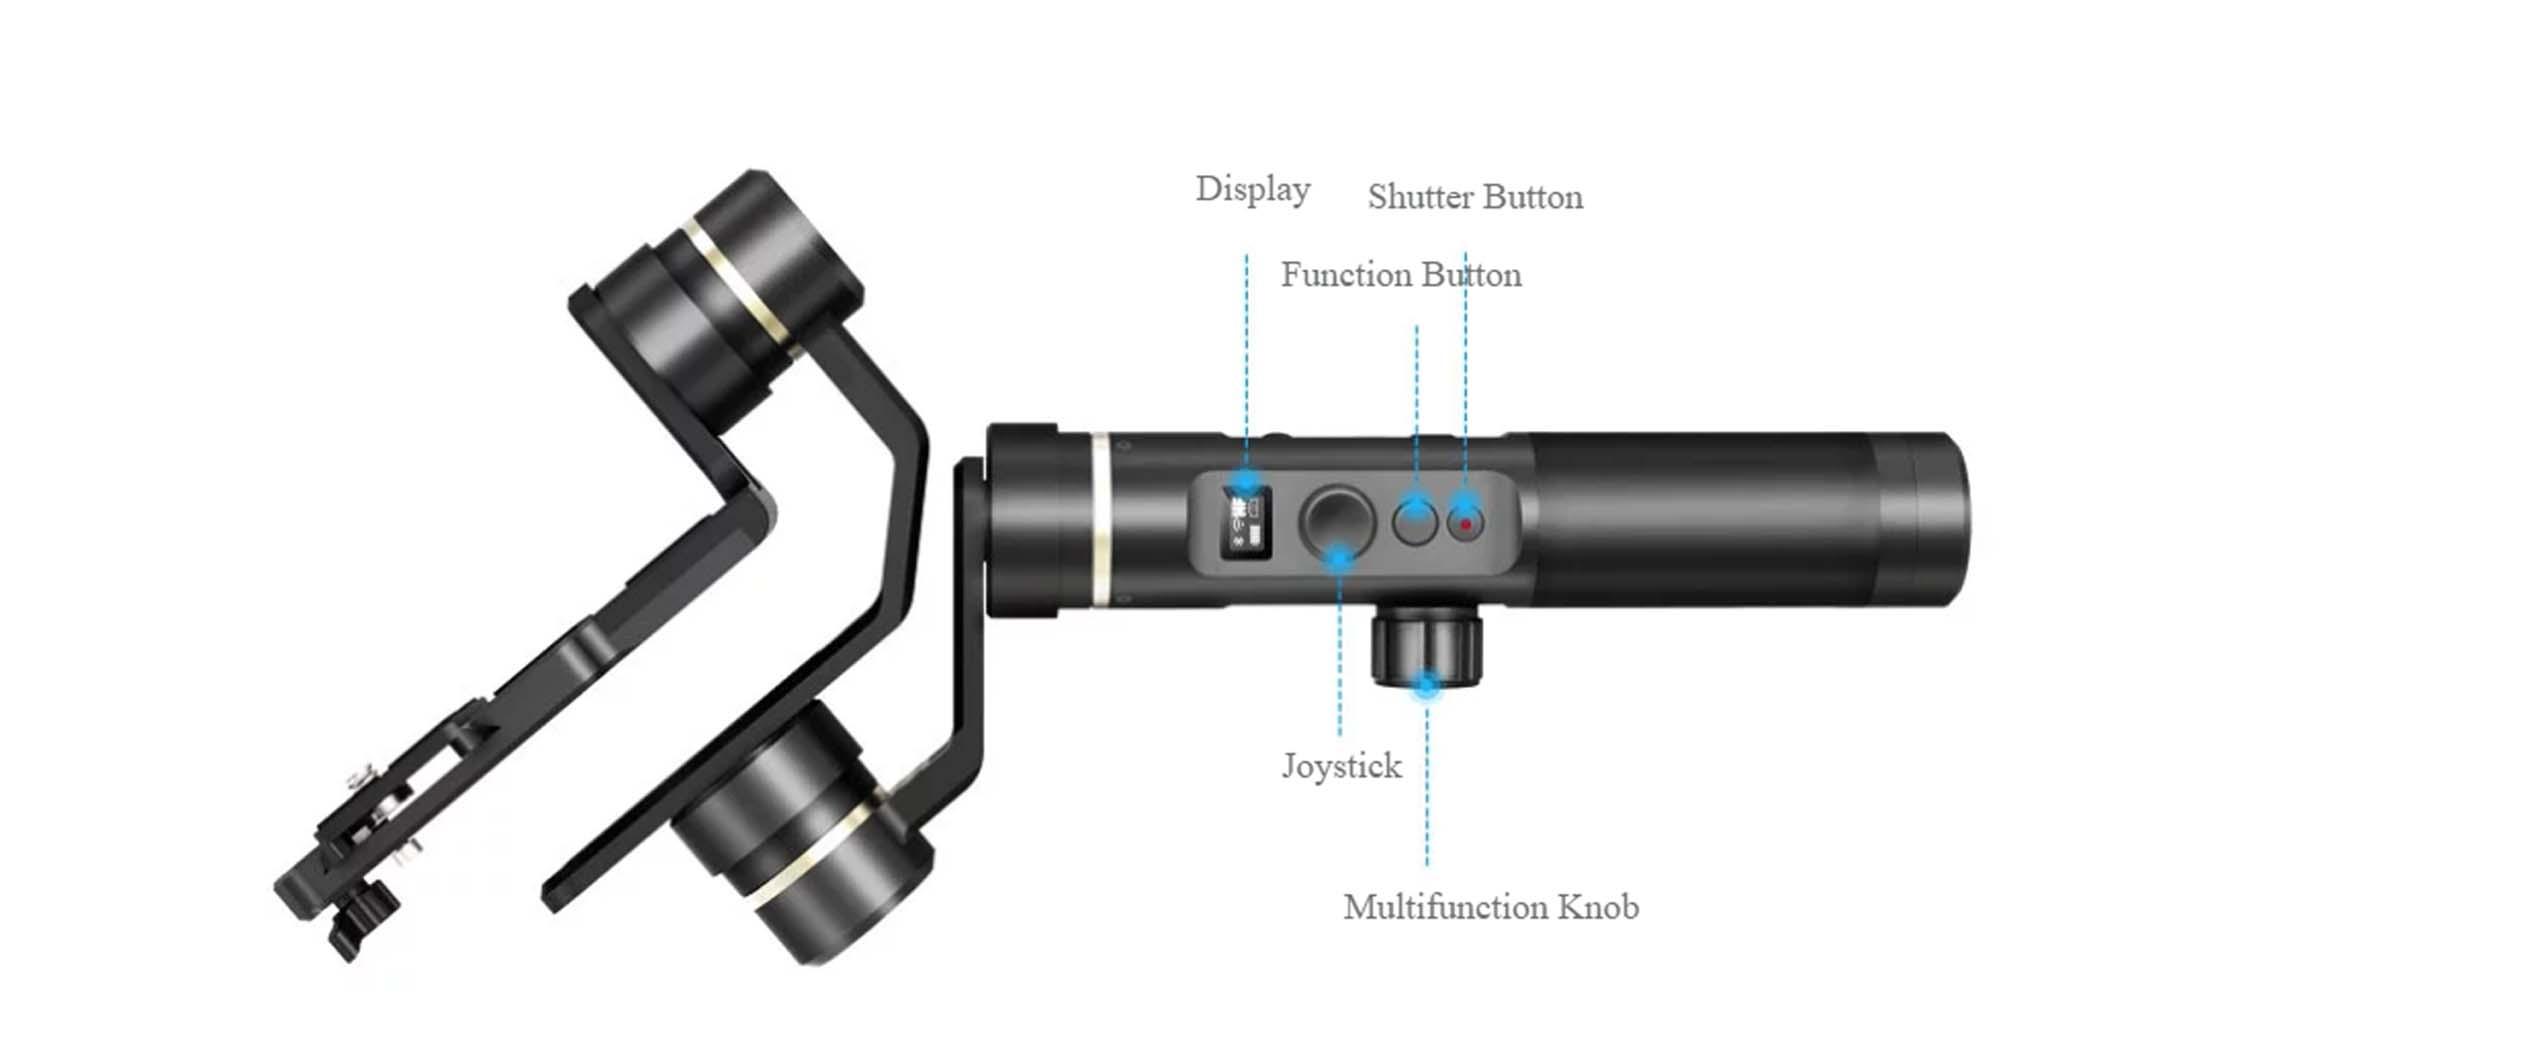 FeiyuTech G6 Plus Gimbal Stabilizer